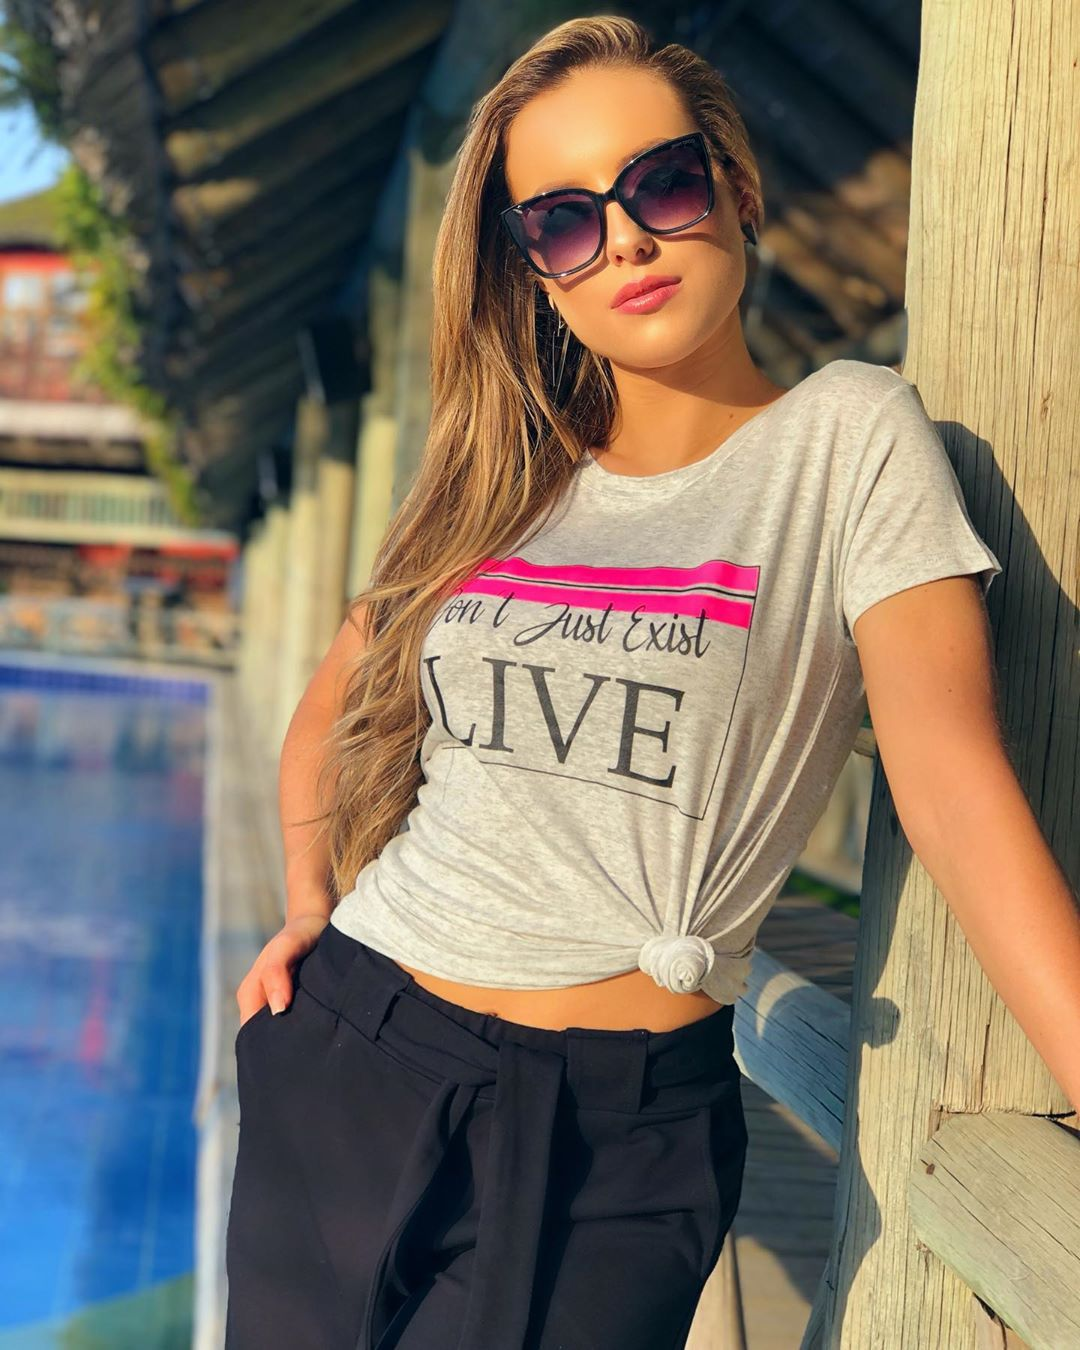 cristine boff sartor, segunda finalista de miss latinoamerica 2019. - Página 6 67721410